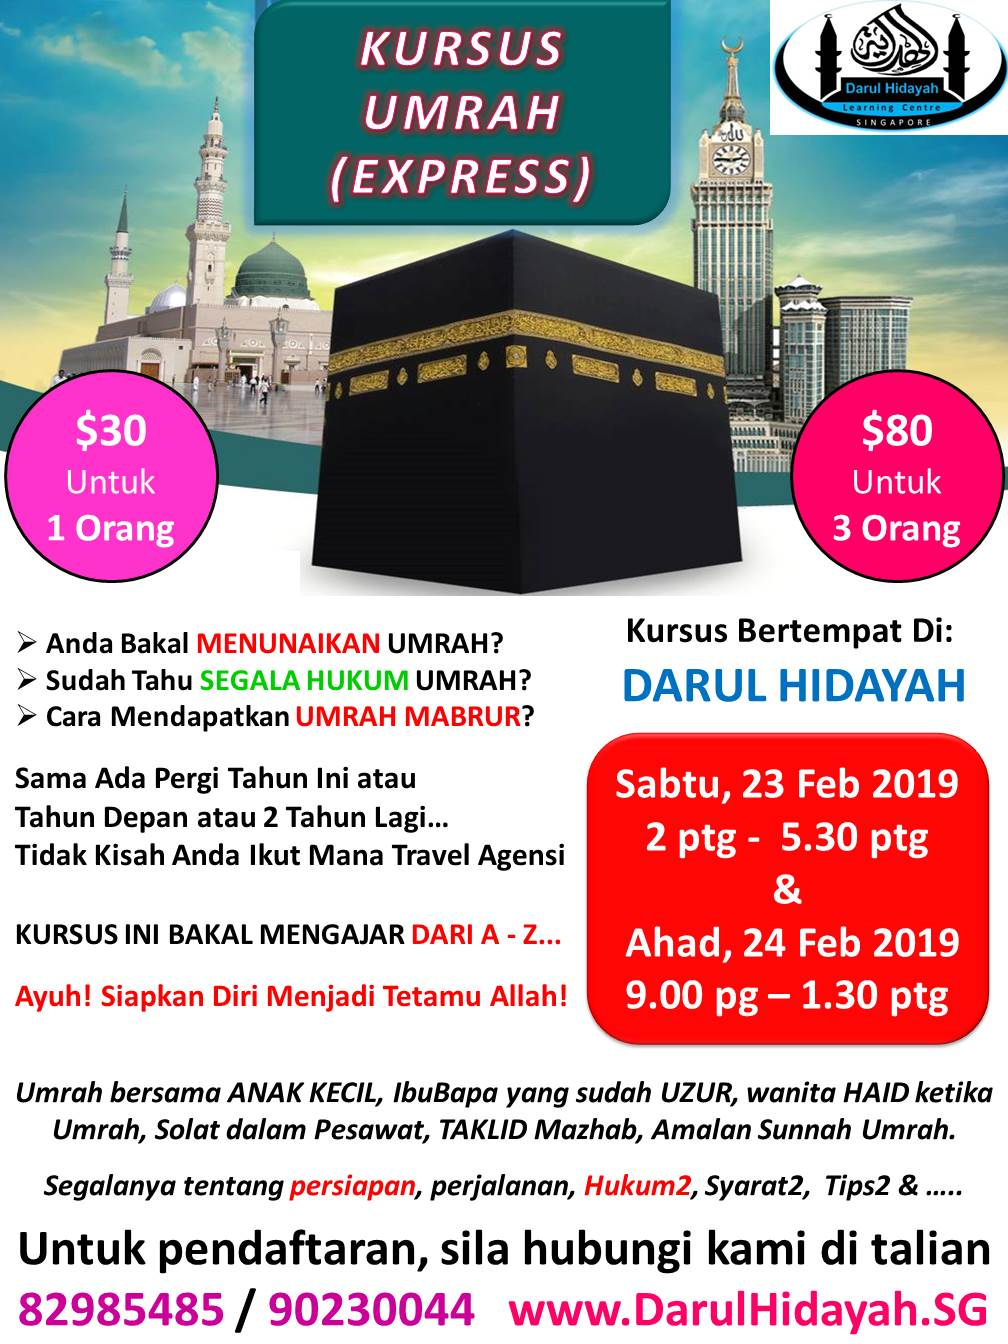 Darul Hidayah Kursus Umrah FEB 2019